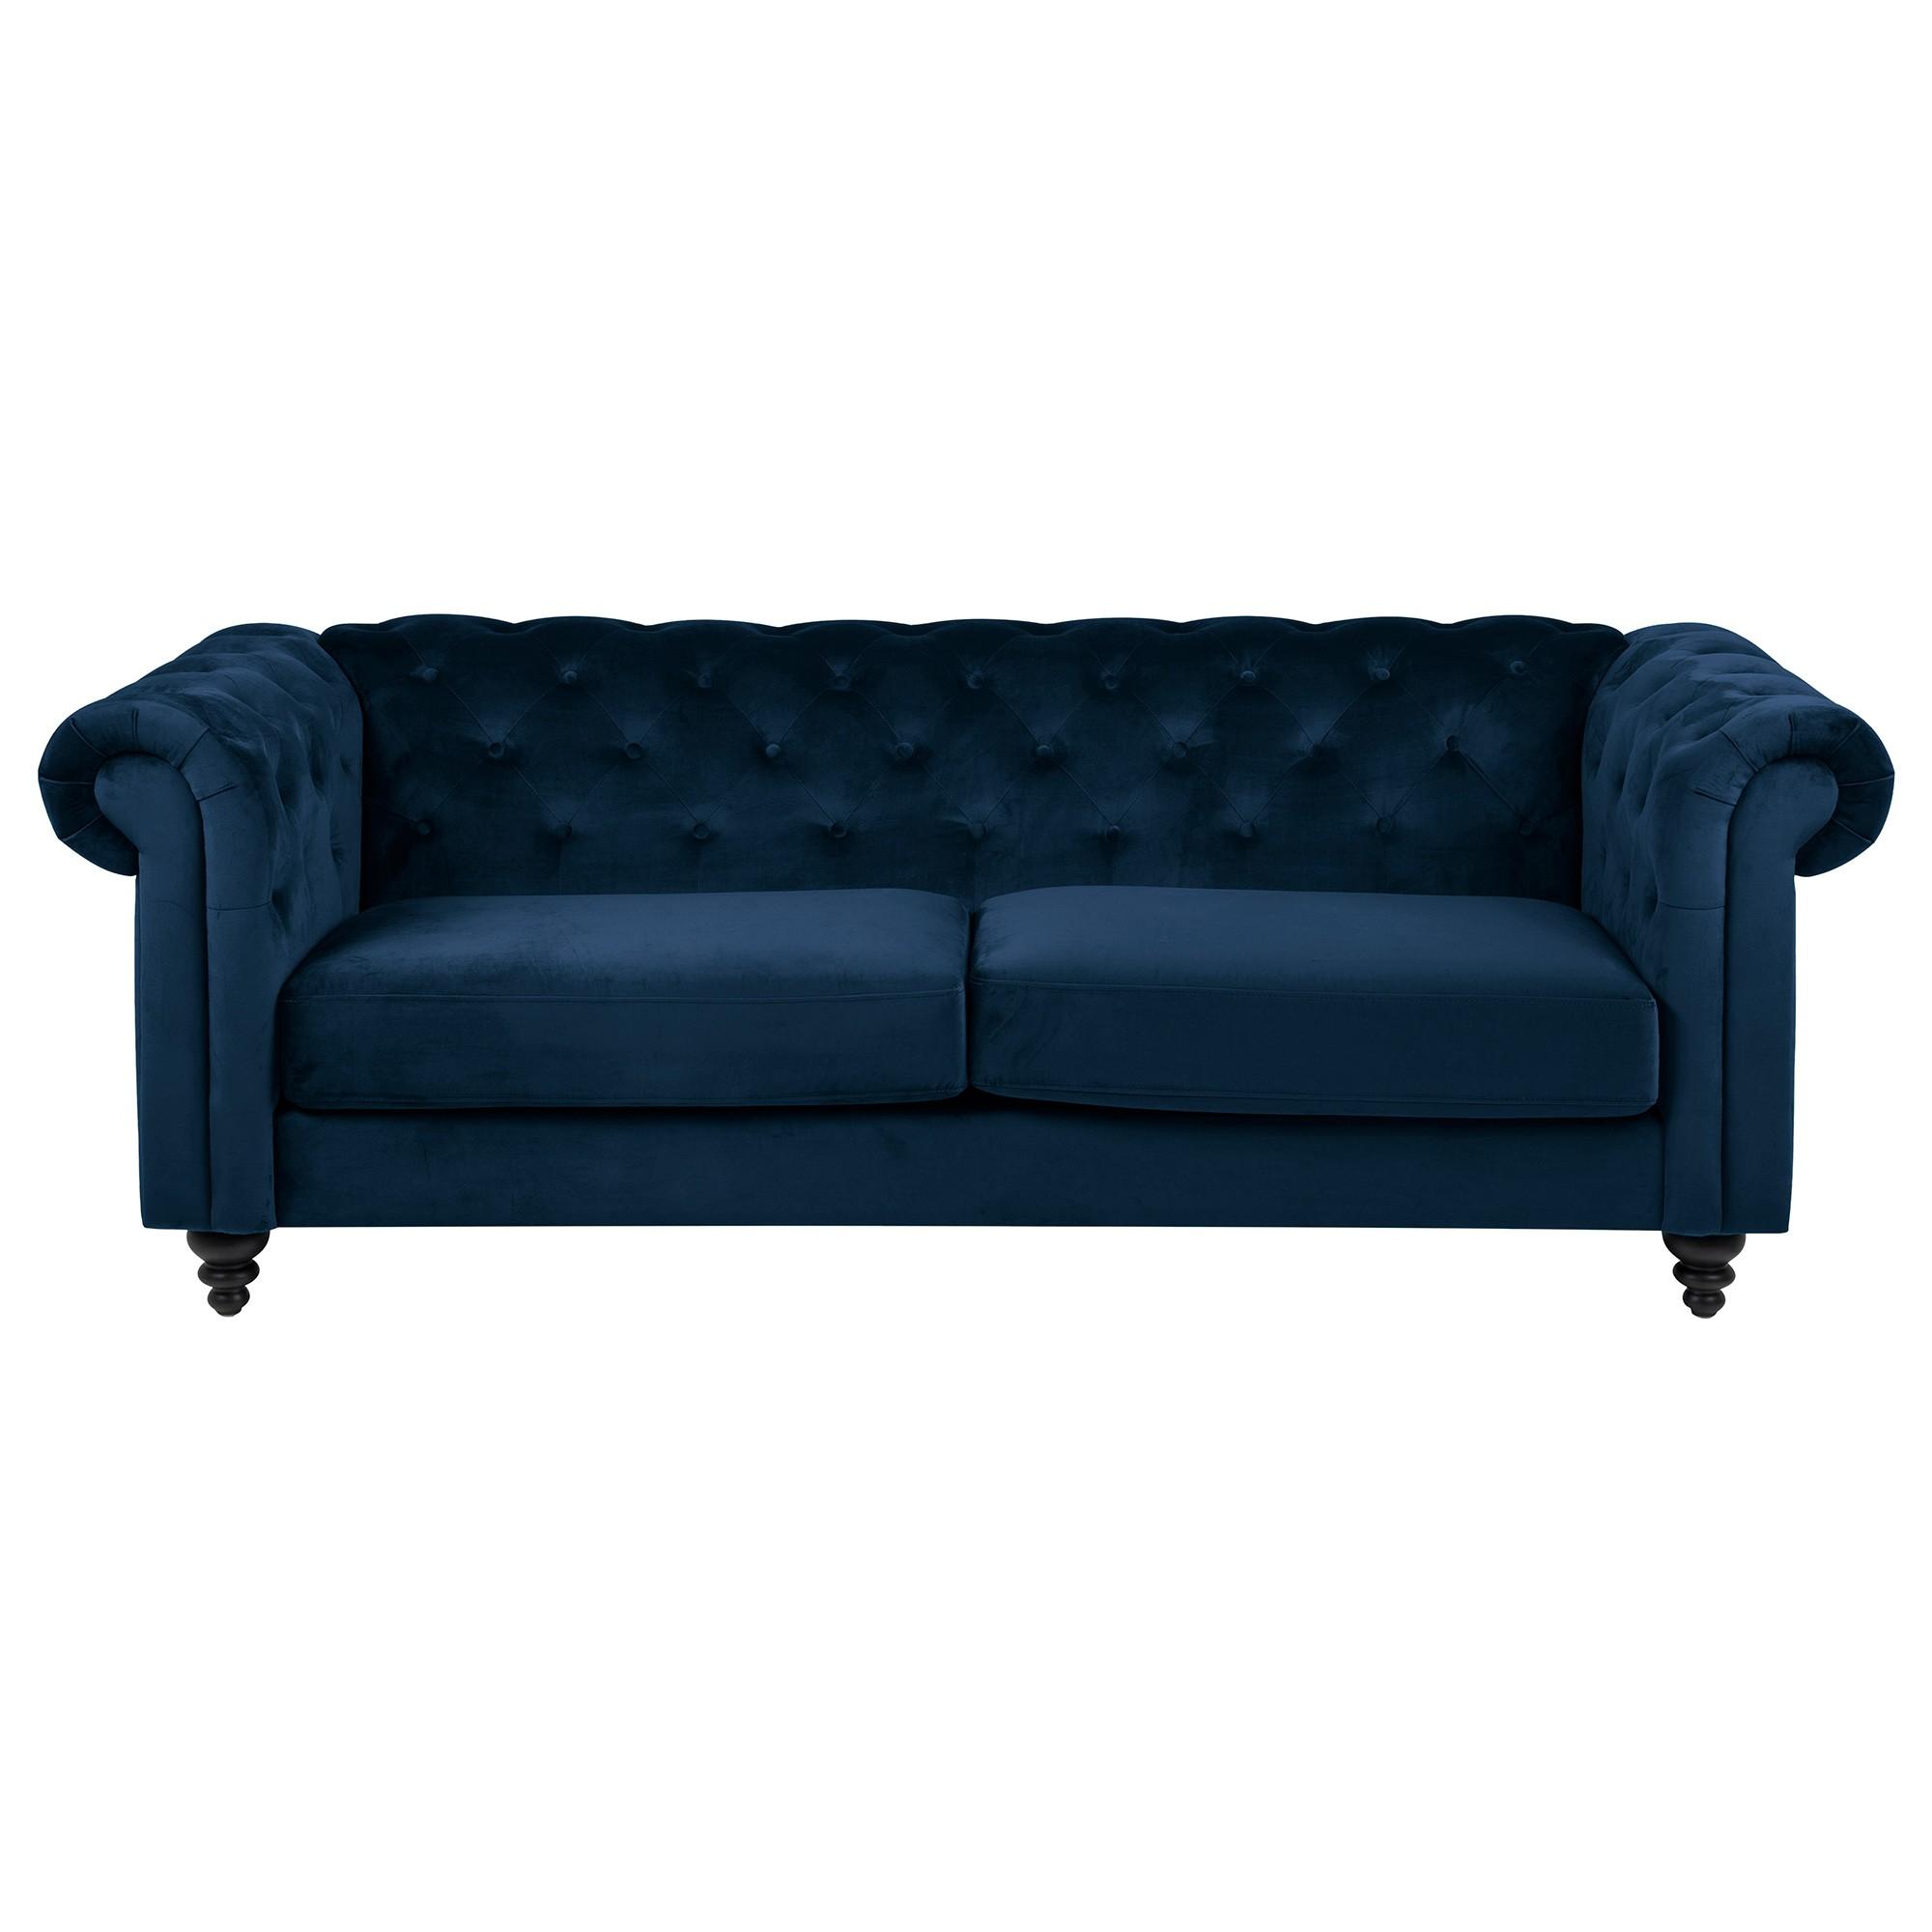 Charles Velvet Fabric Chestfield Sofa, 3 Seater, Sapphire